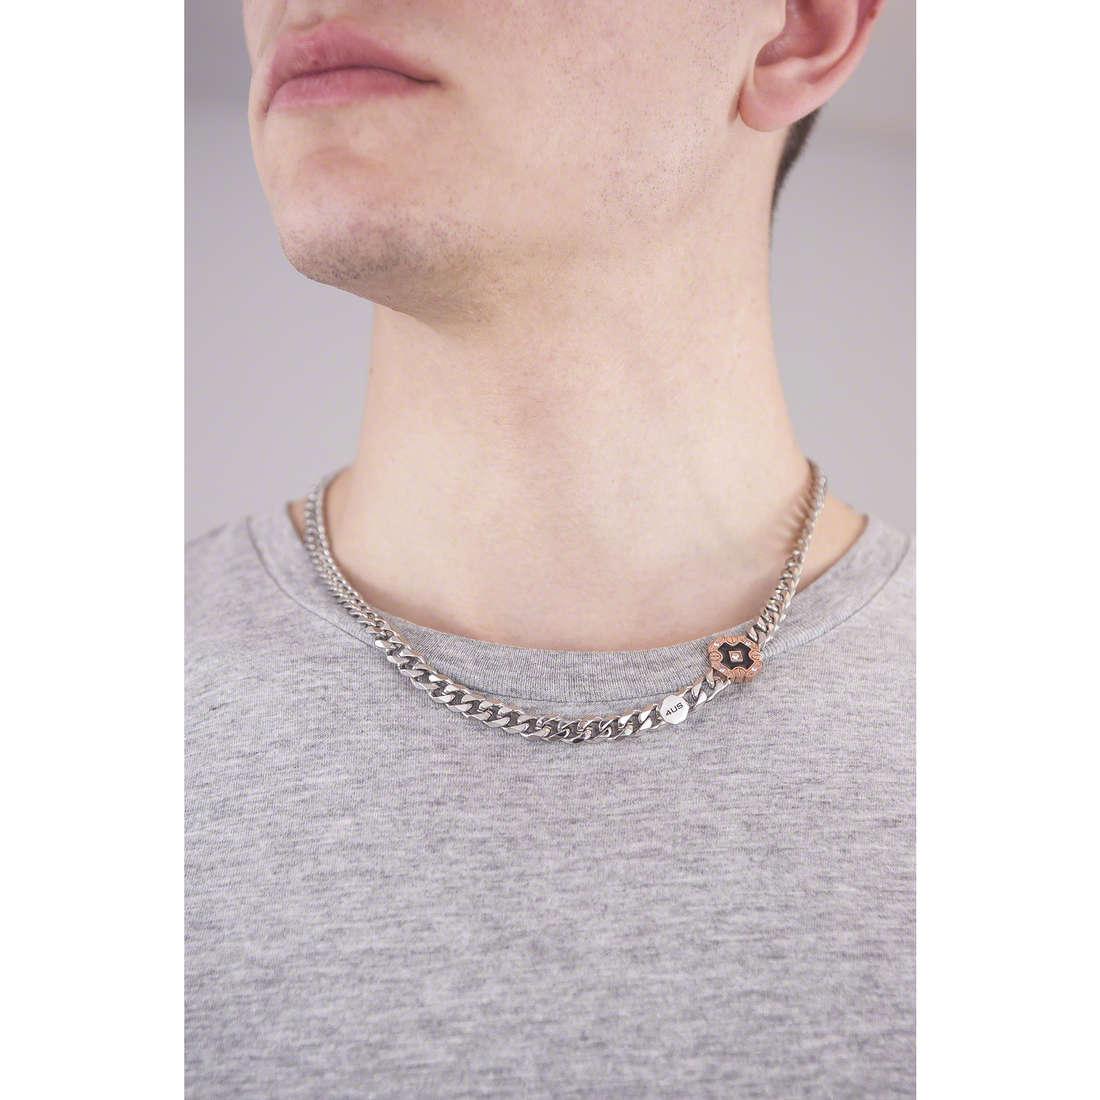 4US Cesare Paciotti necklaces man 4UCL0896 indosso